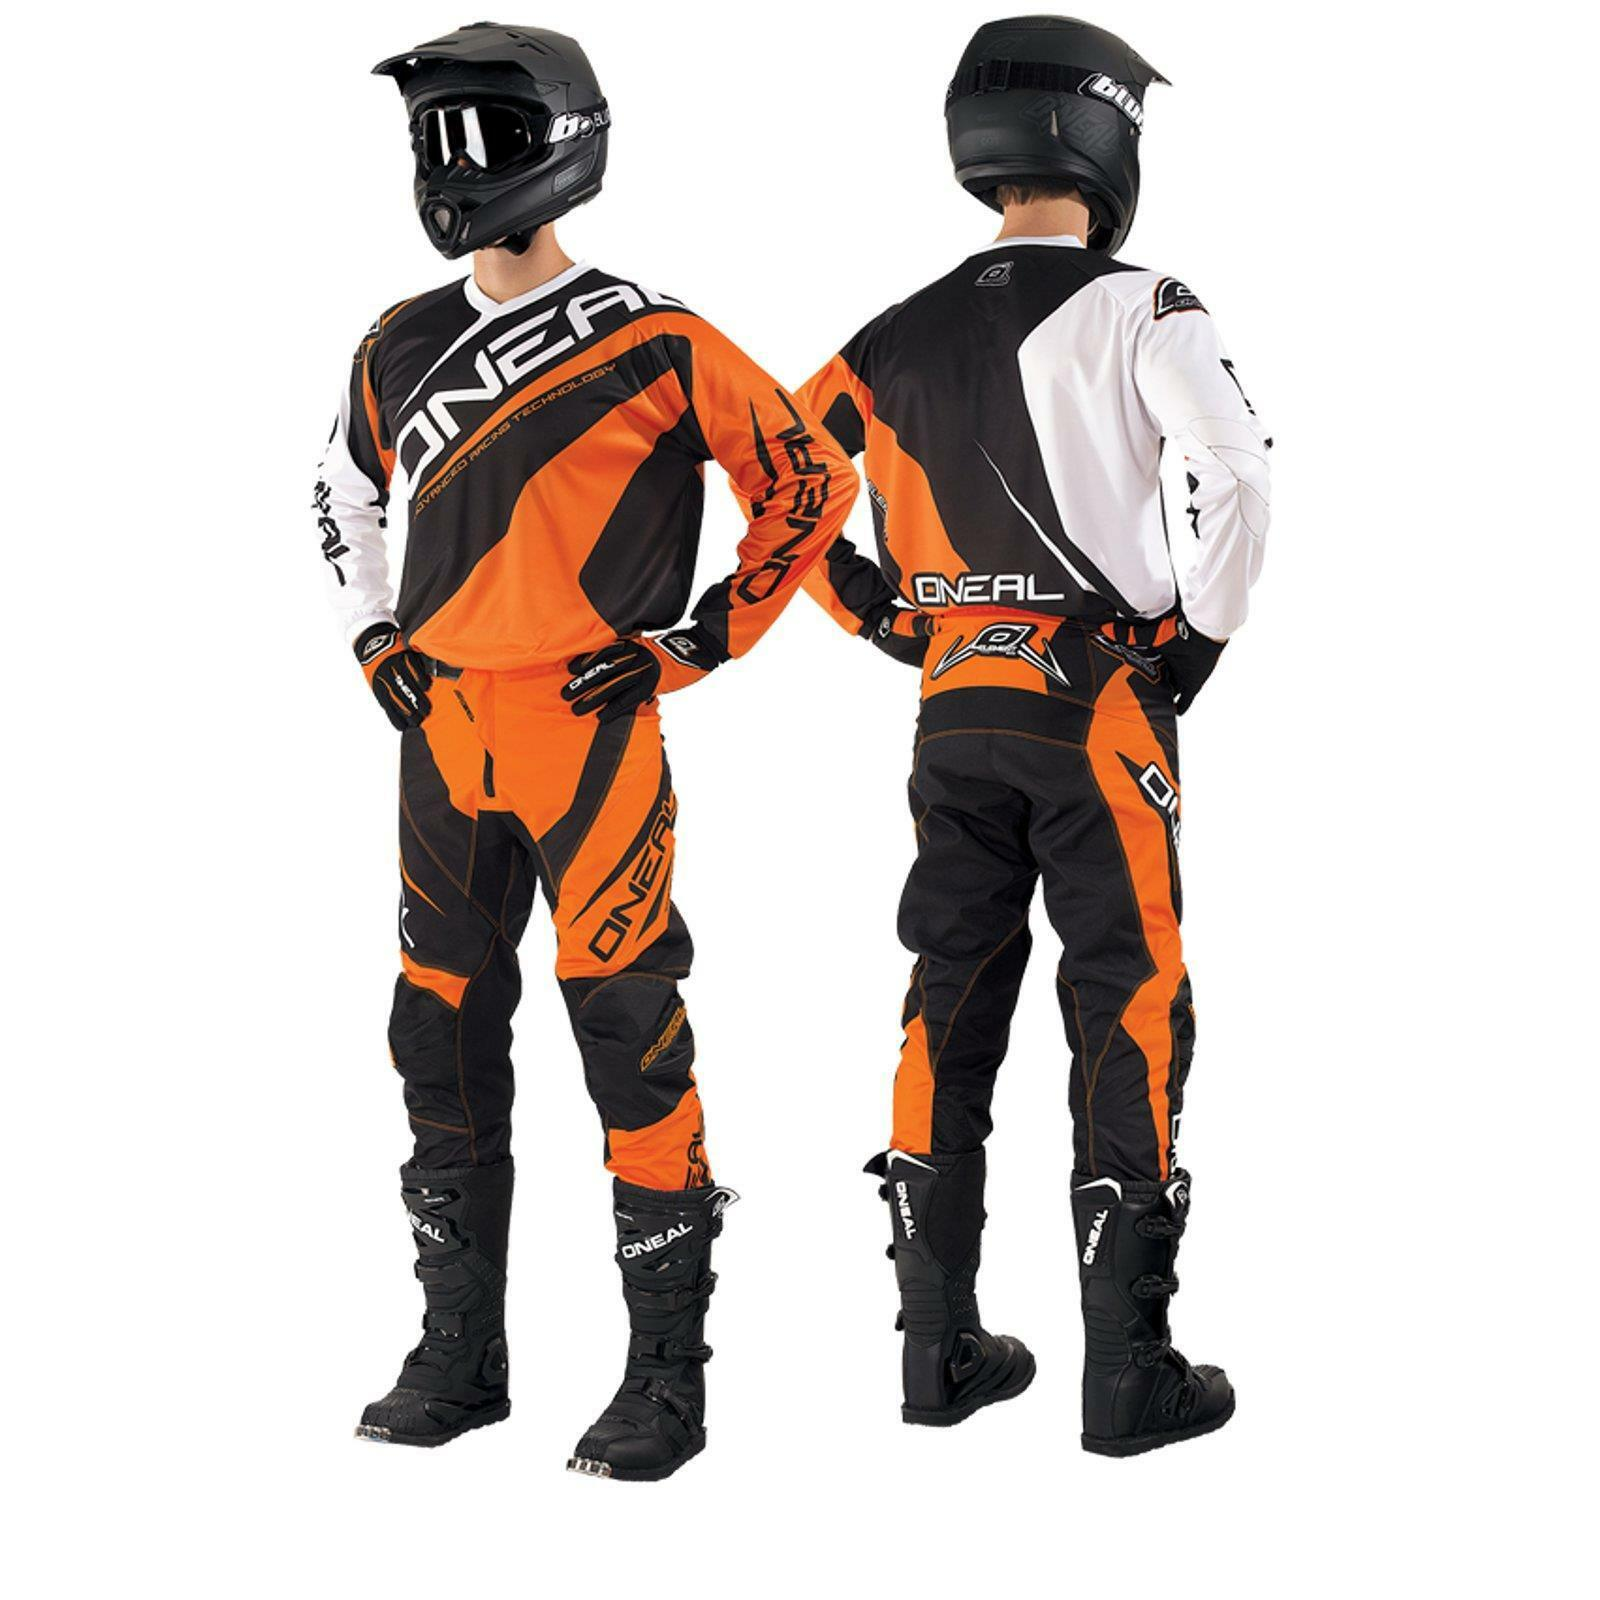 ONeal Element Orange Combo Set Hose Shirt Handschuhe DH MTB FR Fahrrad Freeride    Sorgfältig ausgewählte Materialien